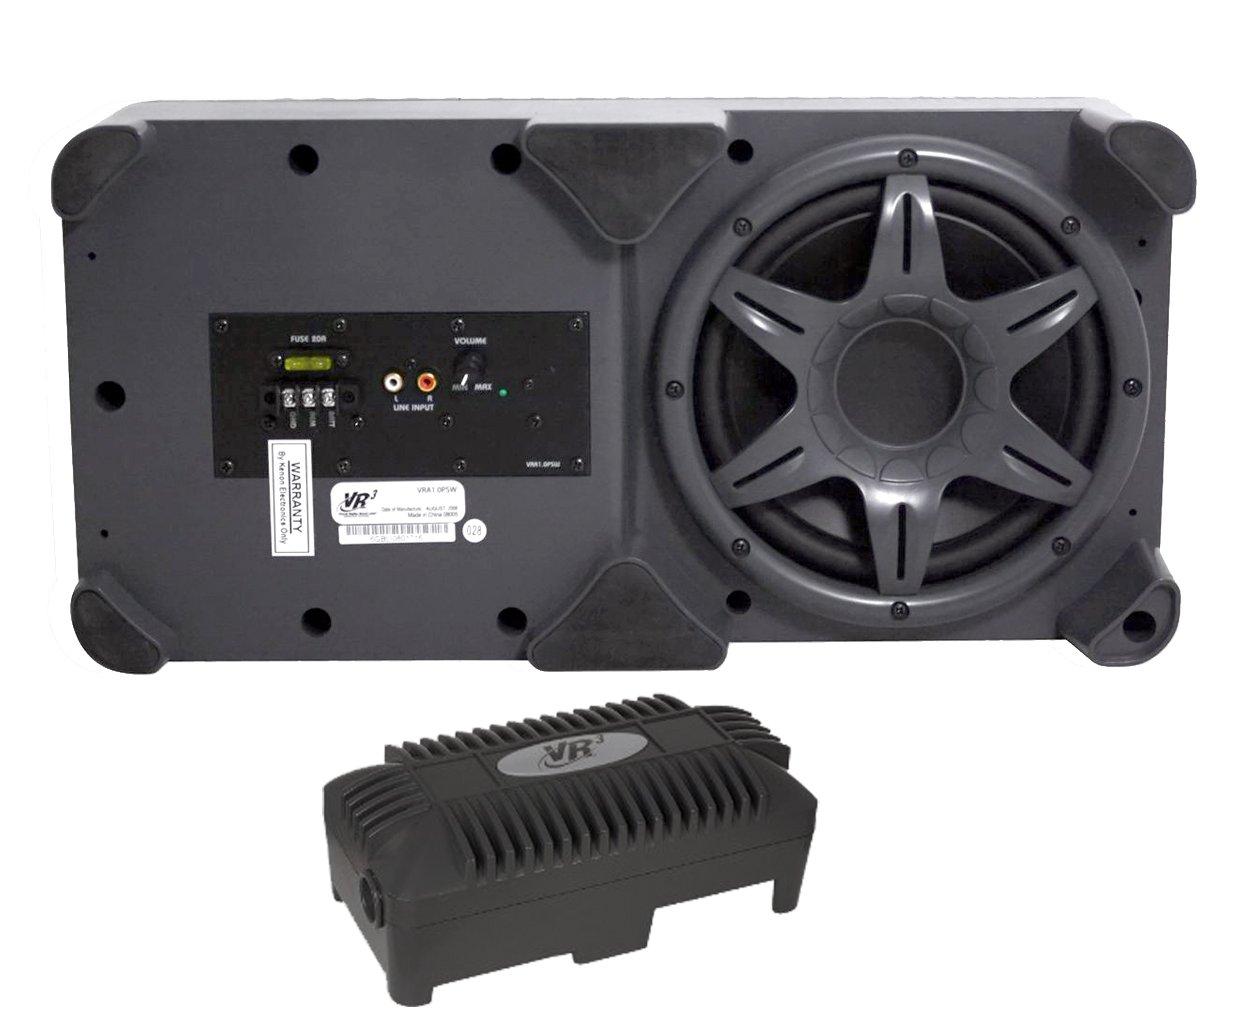 "Amazon.com: VR3 VRA1.0PSW 400-Watt 8"" Powered Car Subwoofer [Electronics]:  Car Electronics"